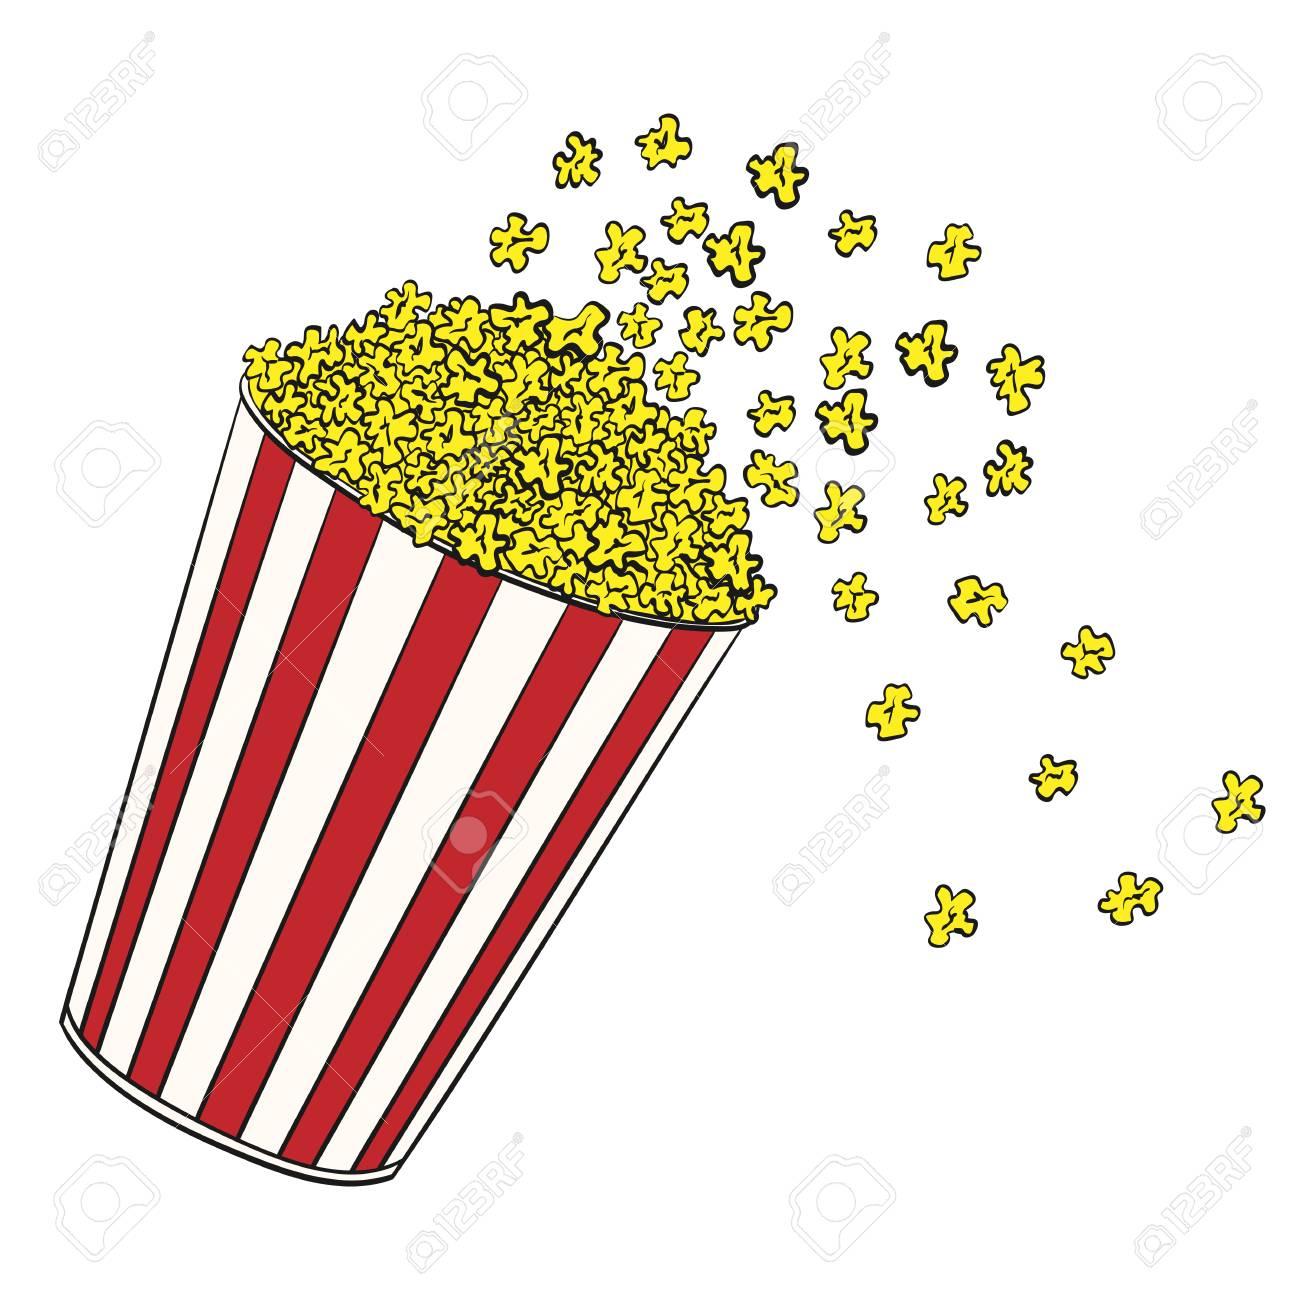 SFT Vs GDE-98216238-cartoon-popcorn-basket.jpg